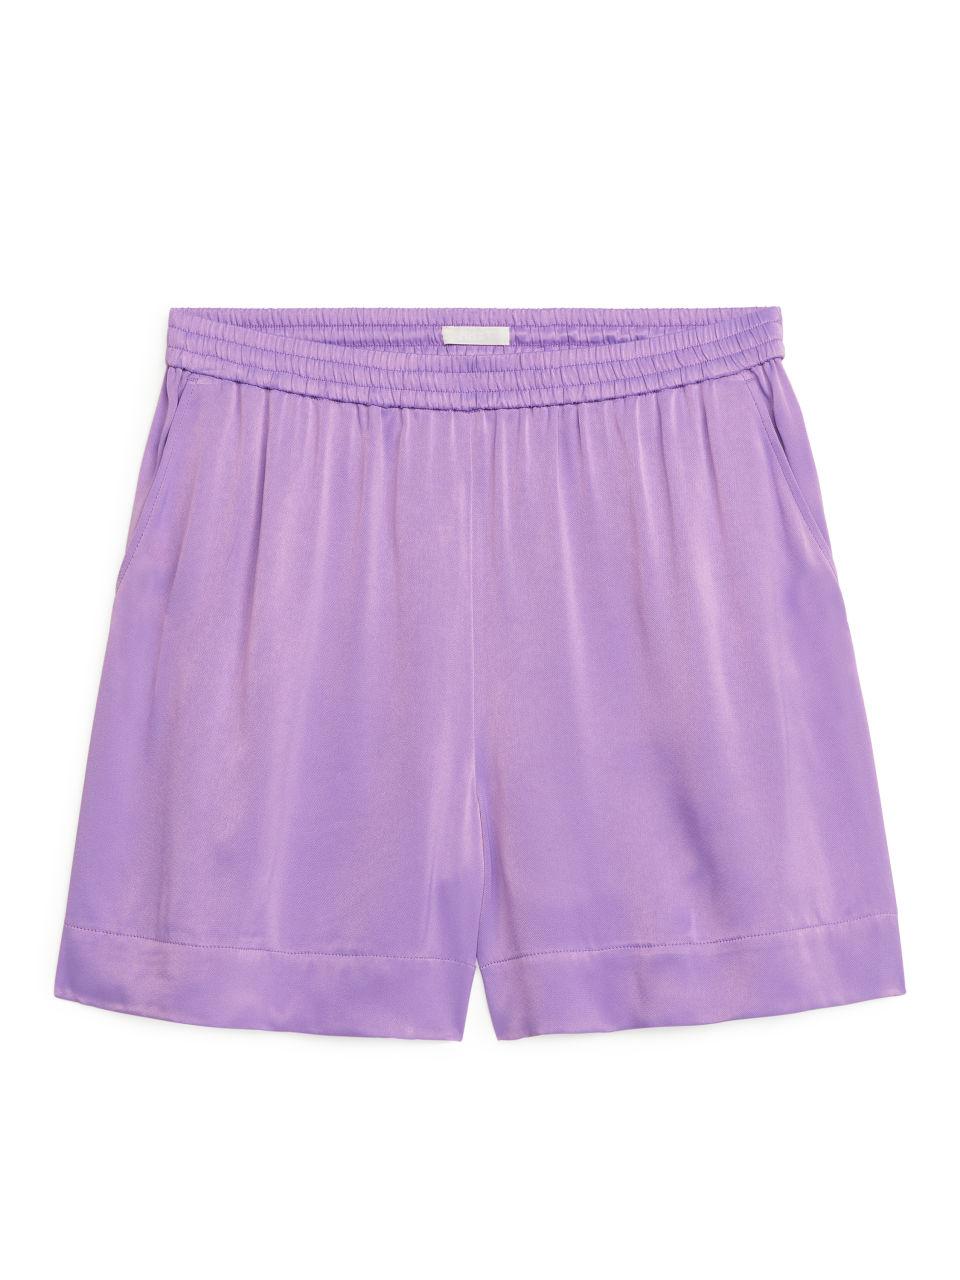 Satin Shorts - Purple